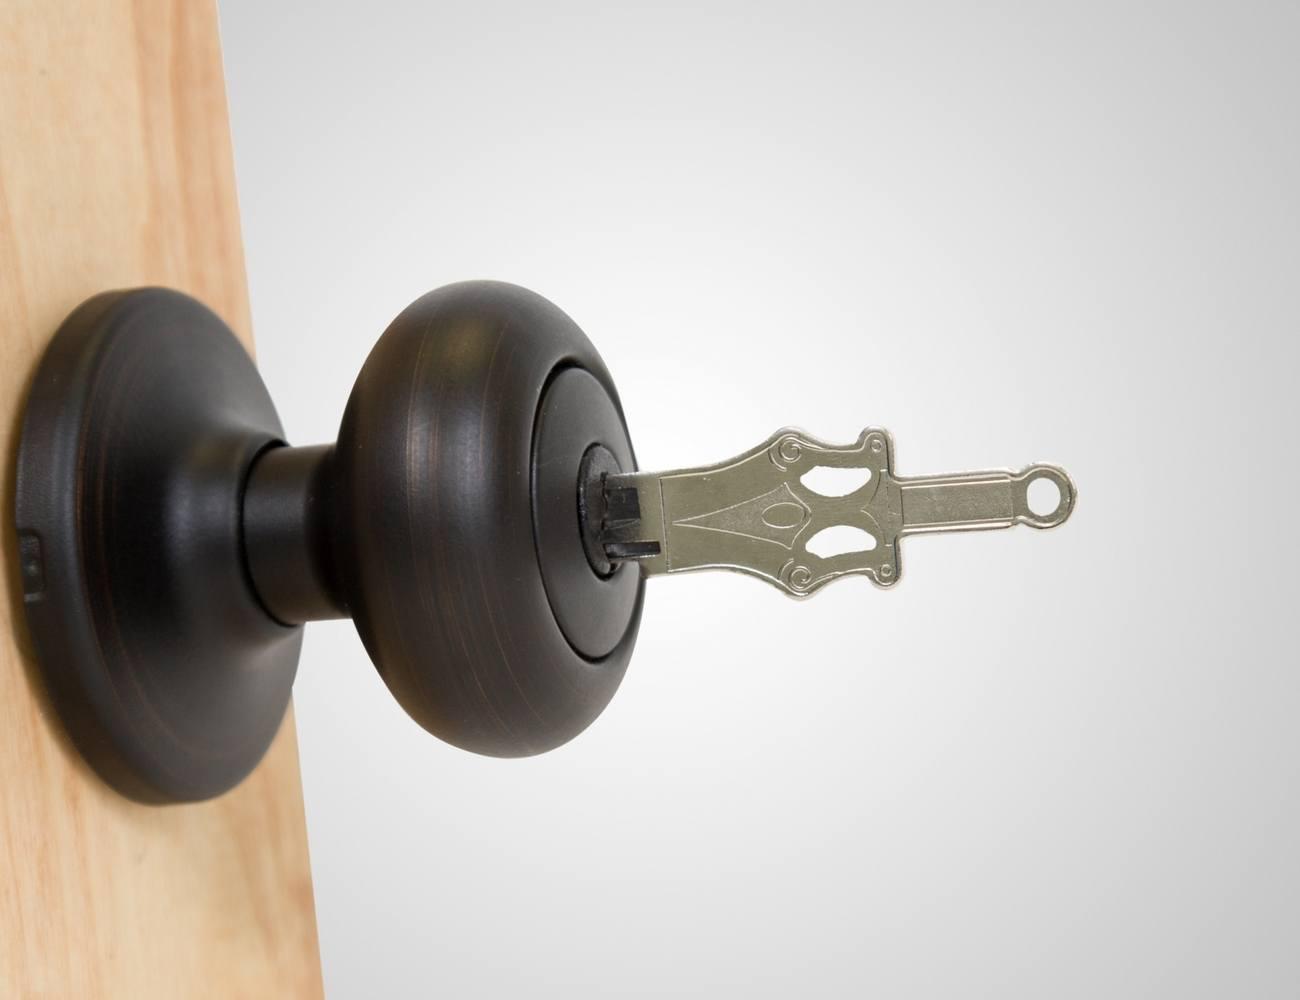 Key Armory Sword Shaped Keys